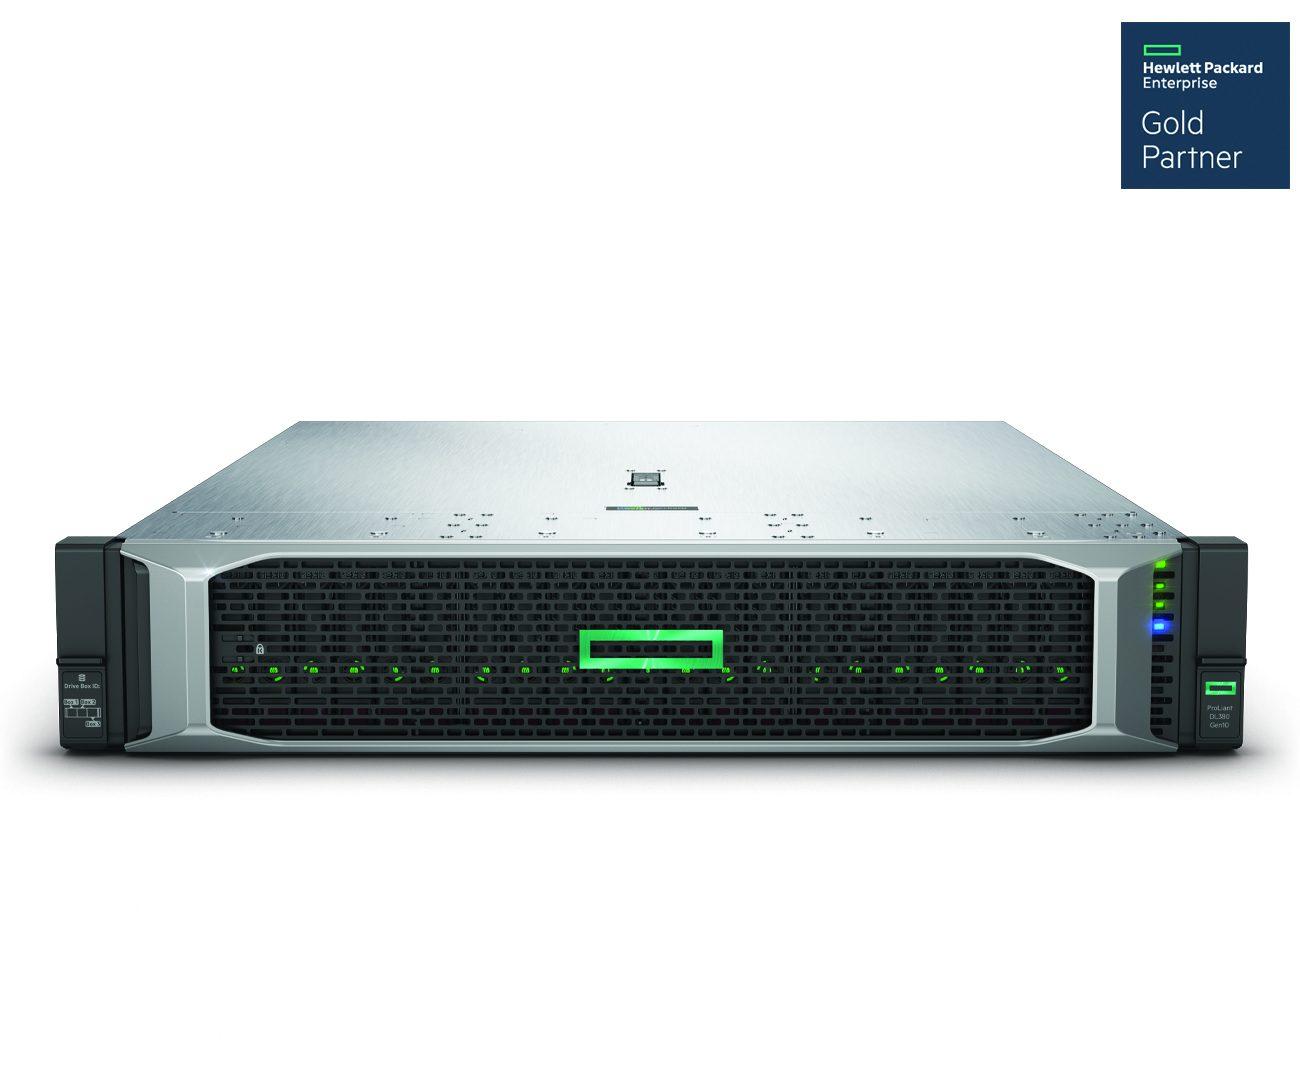 HPE ProLiant DL380 Gen10 Rack Server